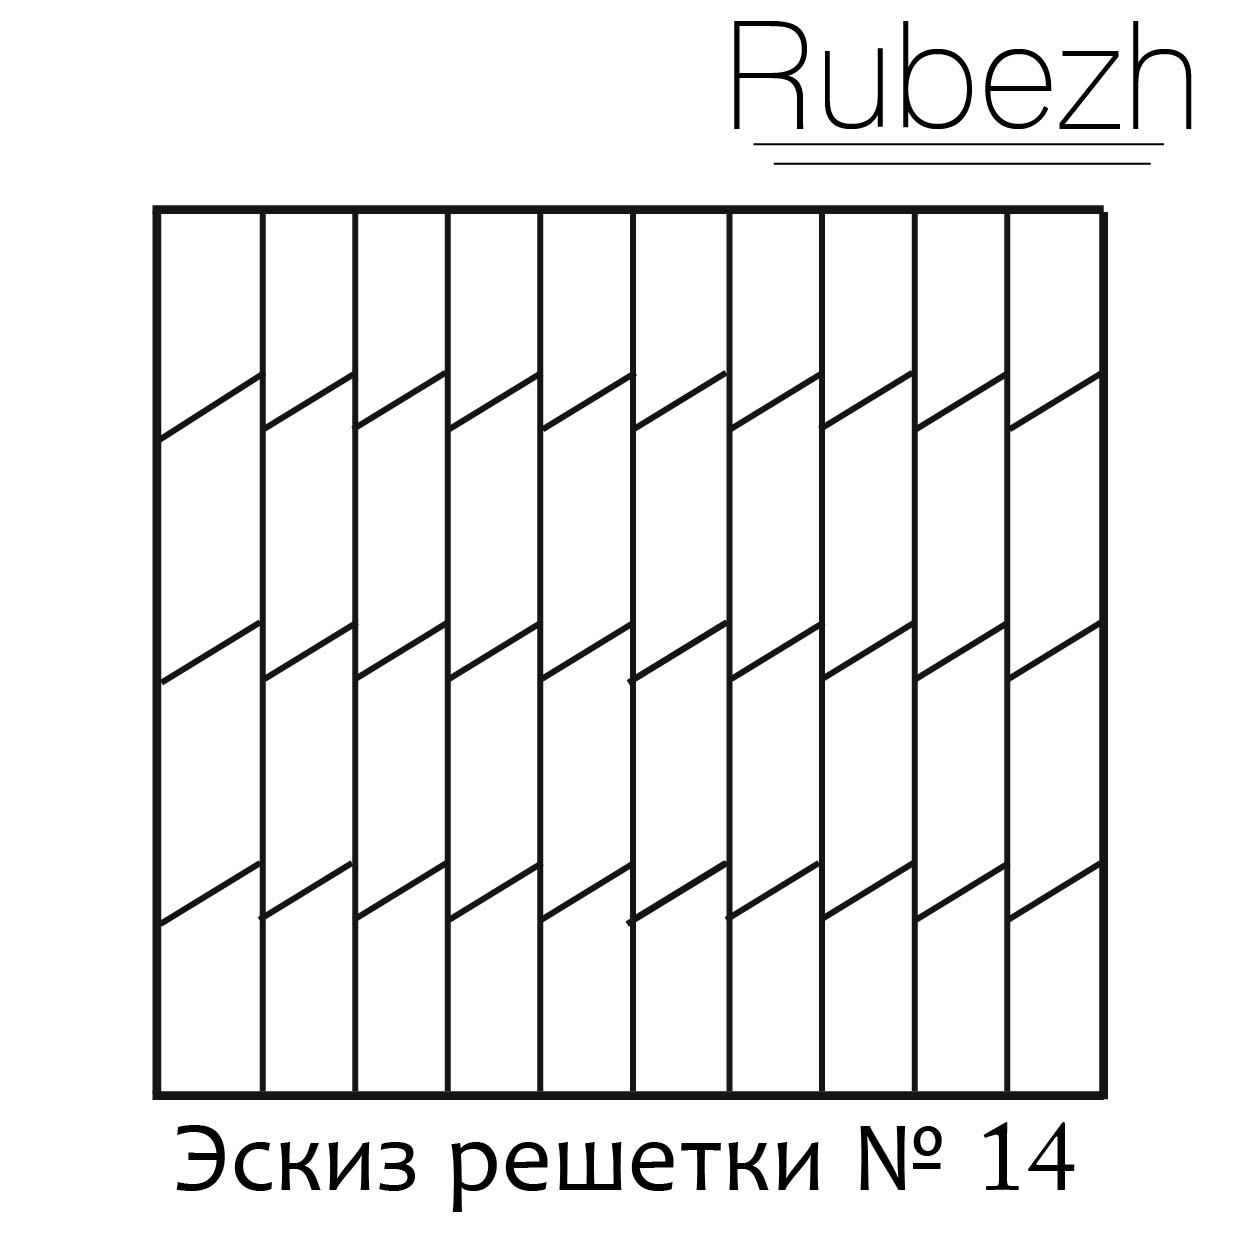 Эскиз решетки № 14